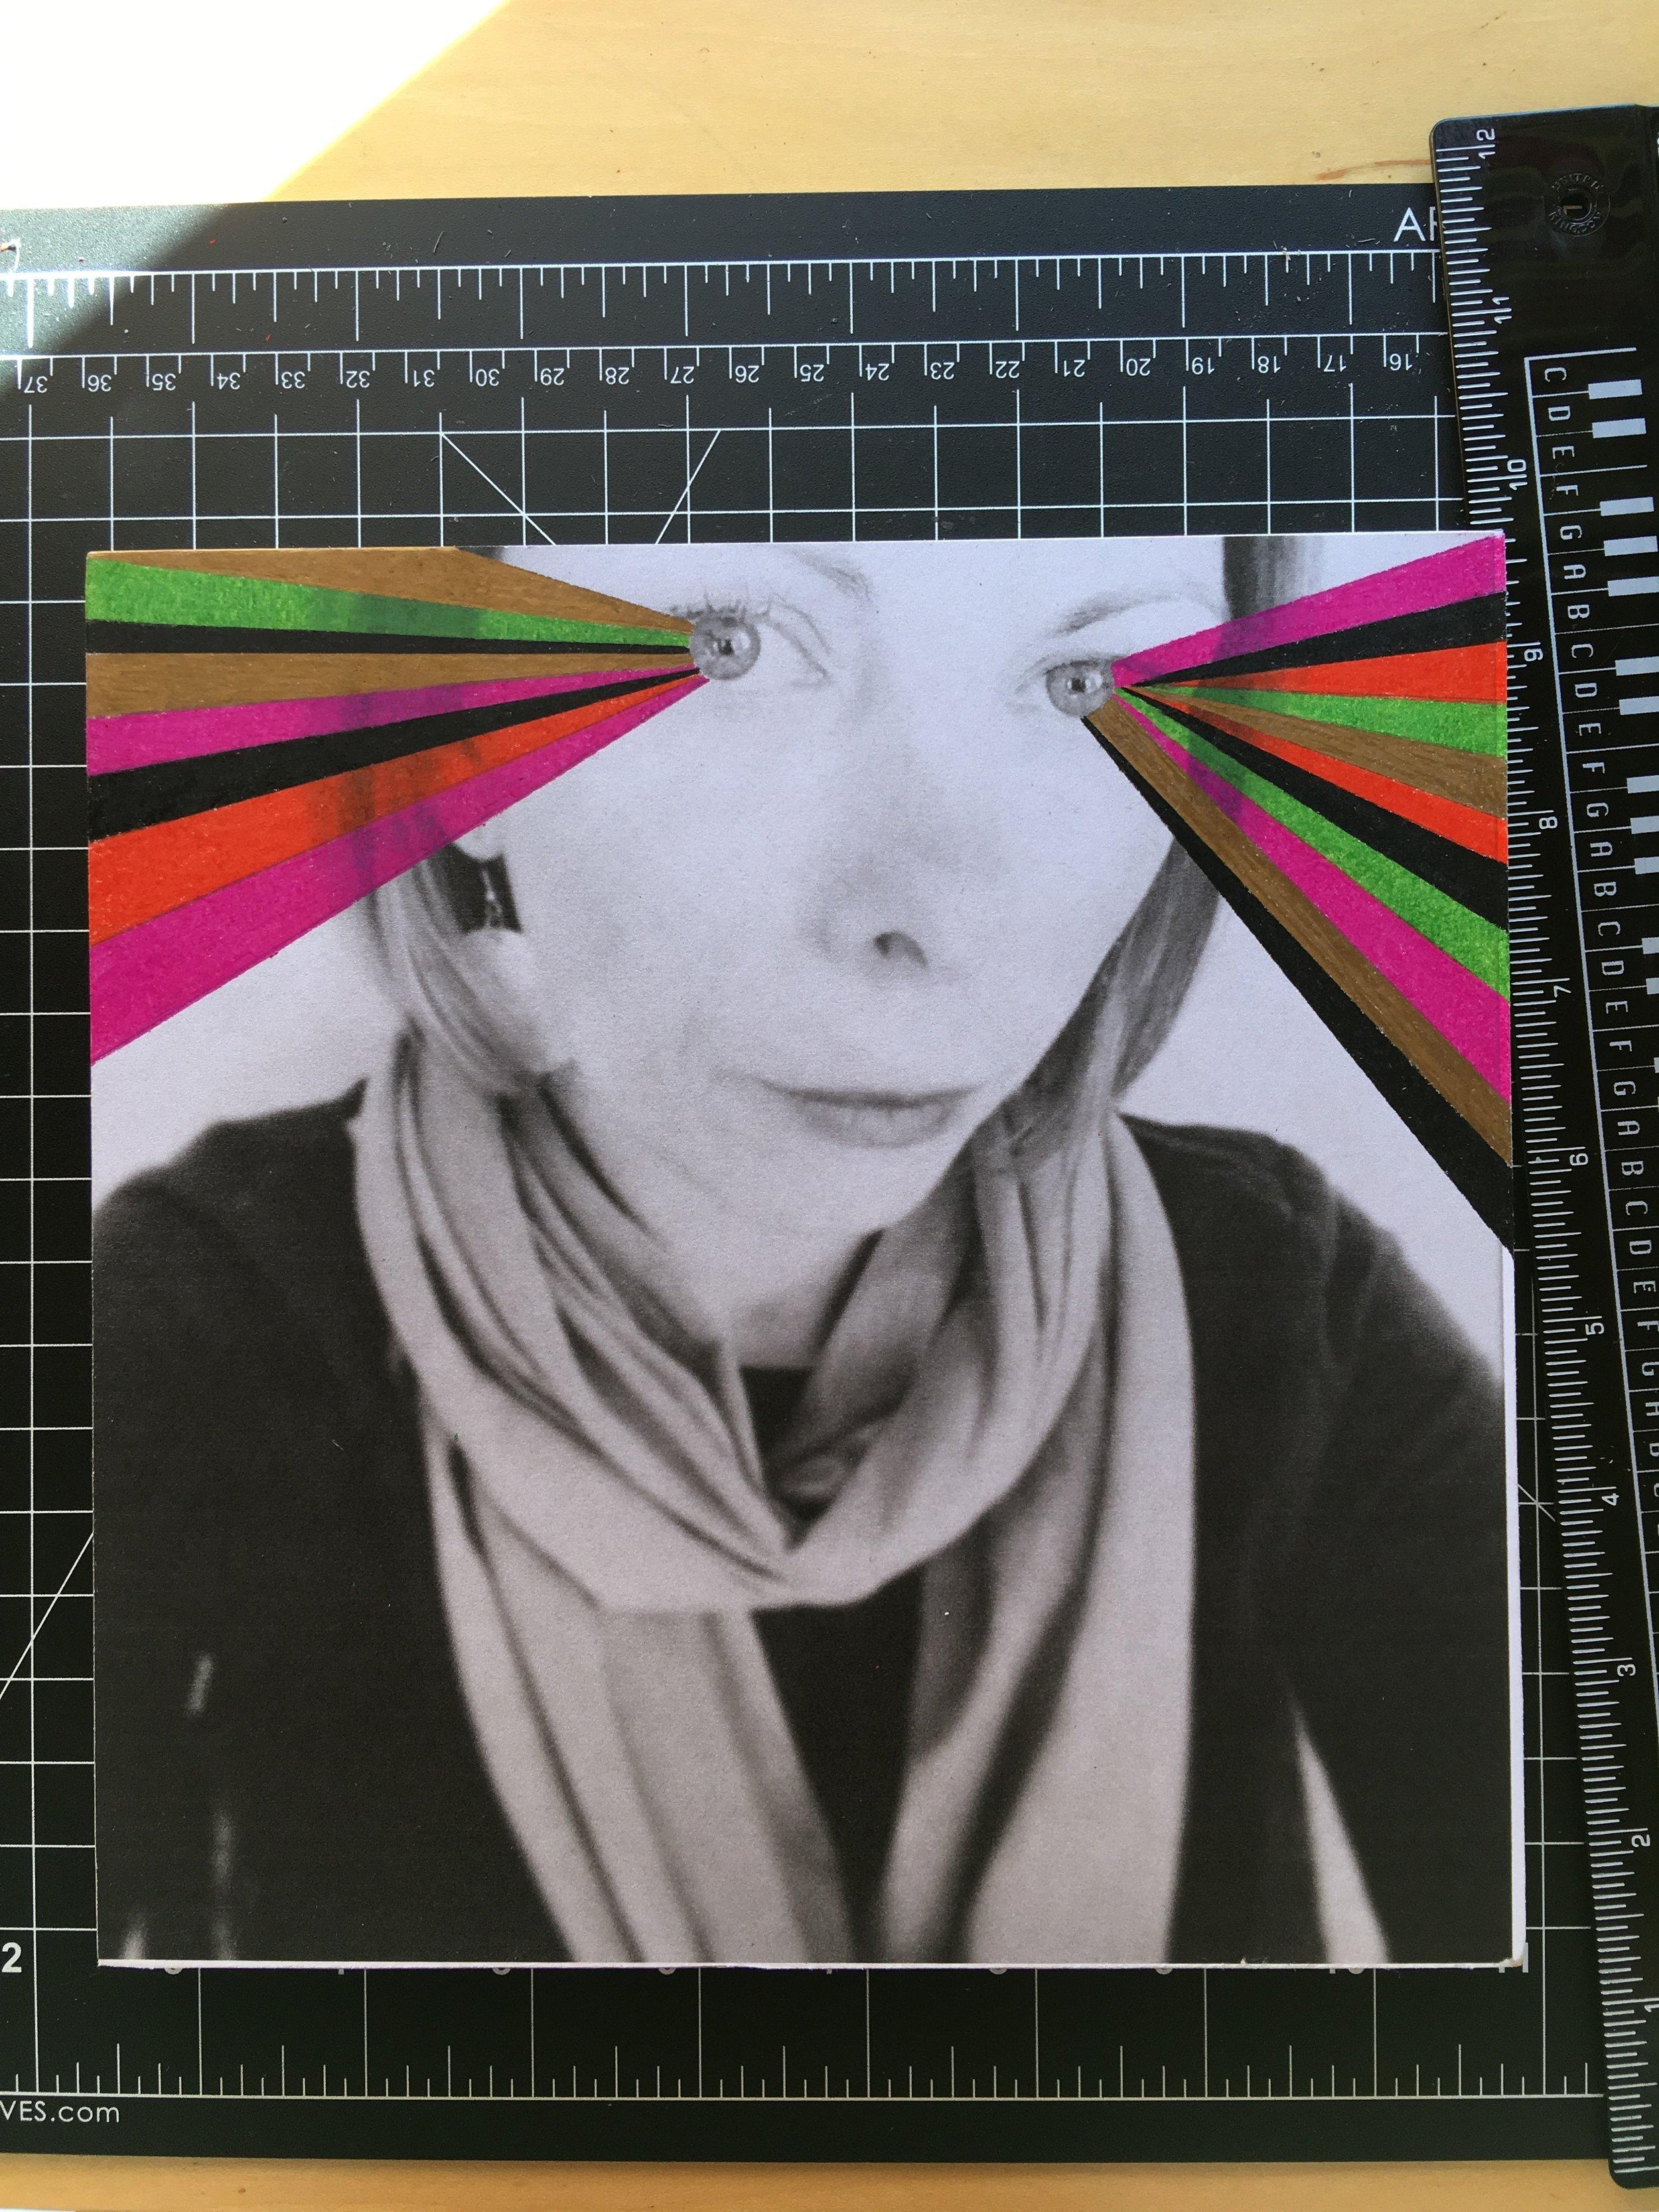 "Mixed media: b/w photocopy + Prisma coloredpencils on an 8"" x 8"" hardwood panel"